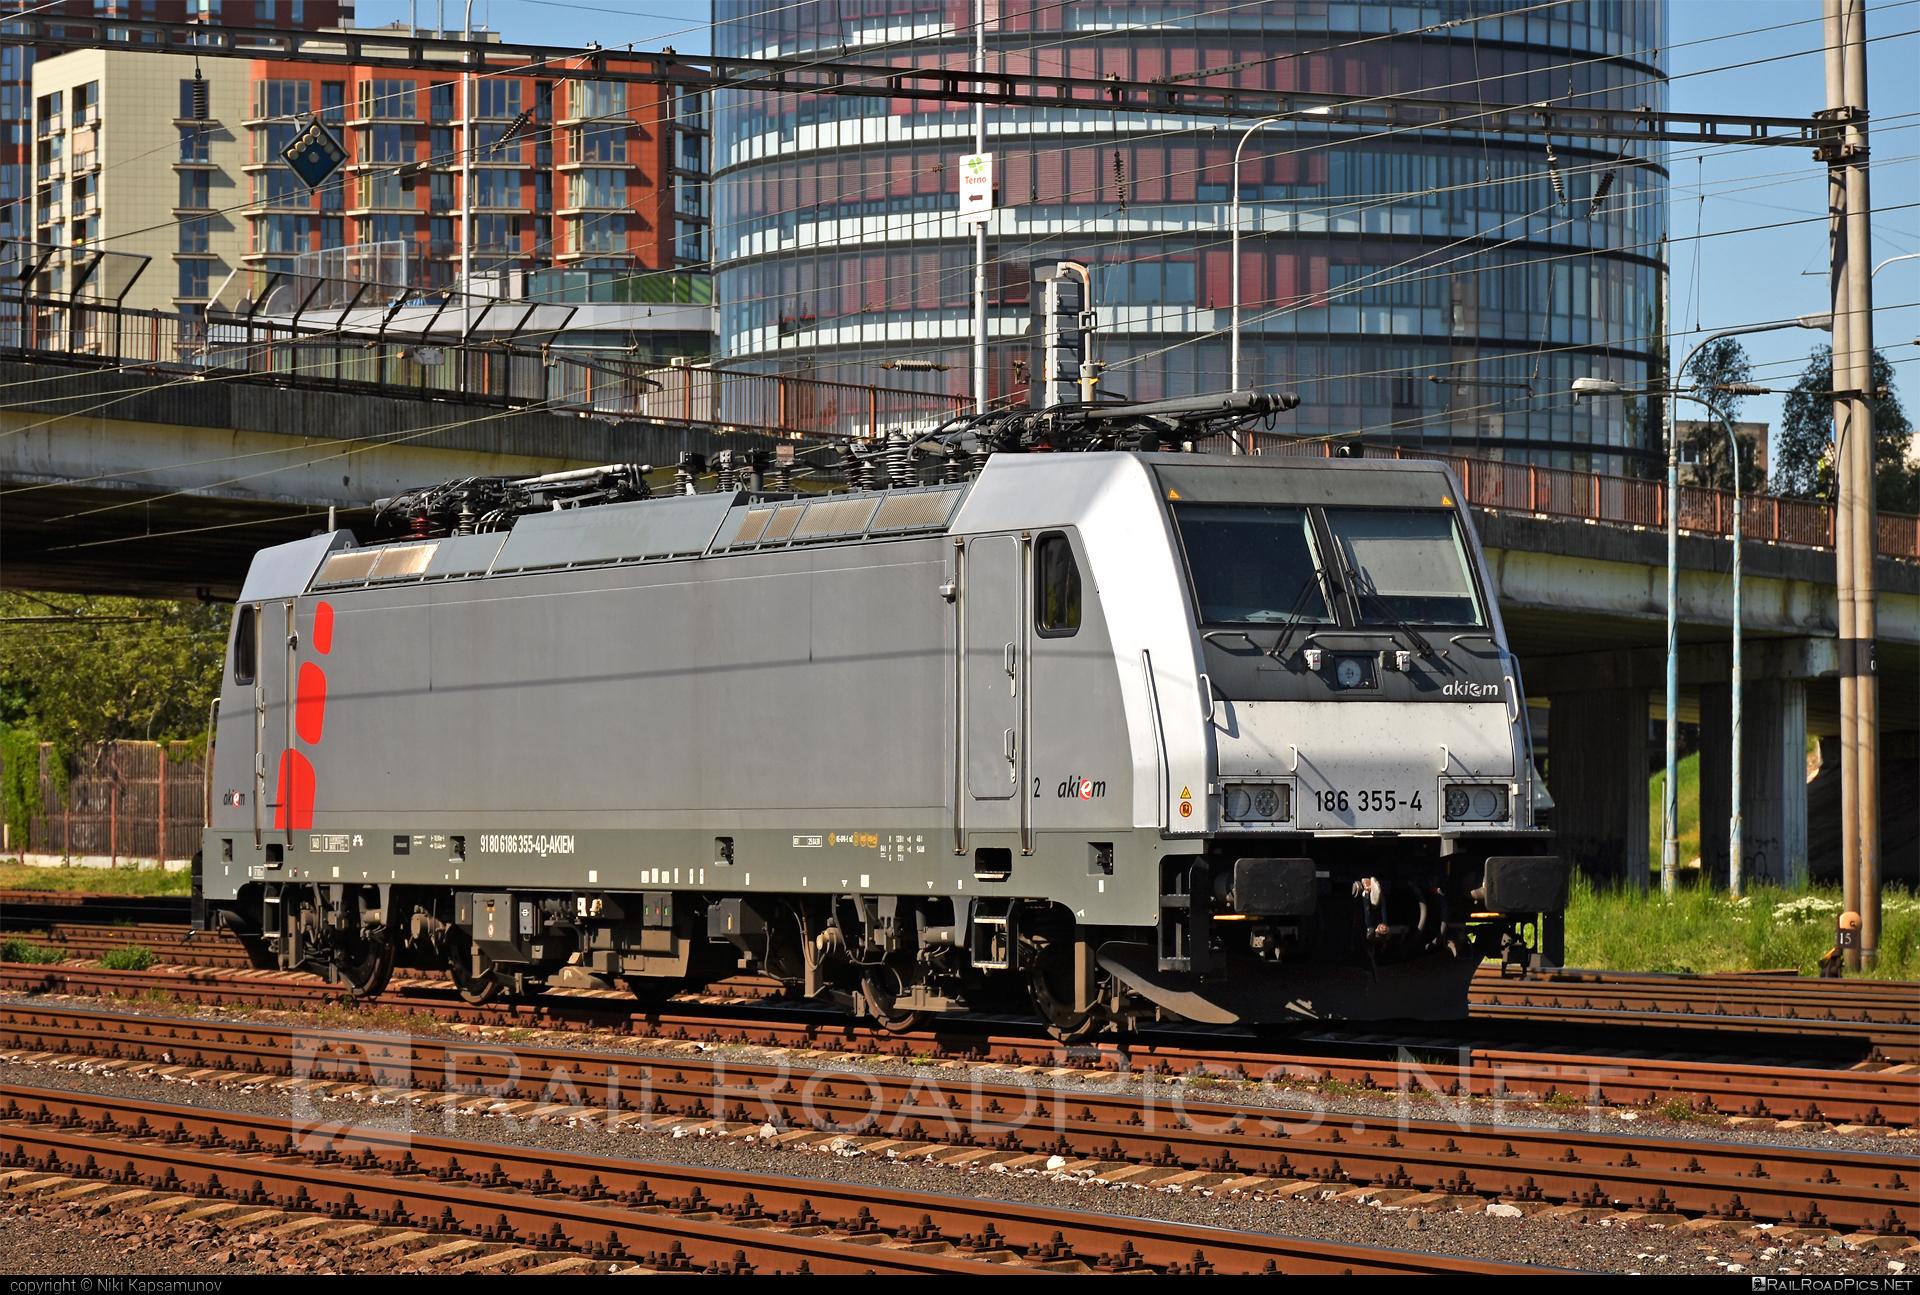 Bombardier TRAXX F140 MS - 186 355-4 operated by LTE Logistik und Transport GmbH #akiem #akiemsas #bombardier #bombardiertraxx #lte #ltelogistikundtransport #ltelogistikundtransportgmbh #traxx #traxxf140 #traxxf140ms